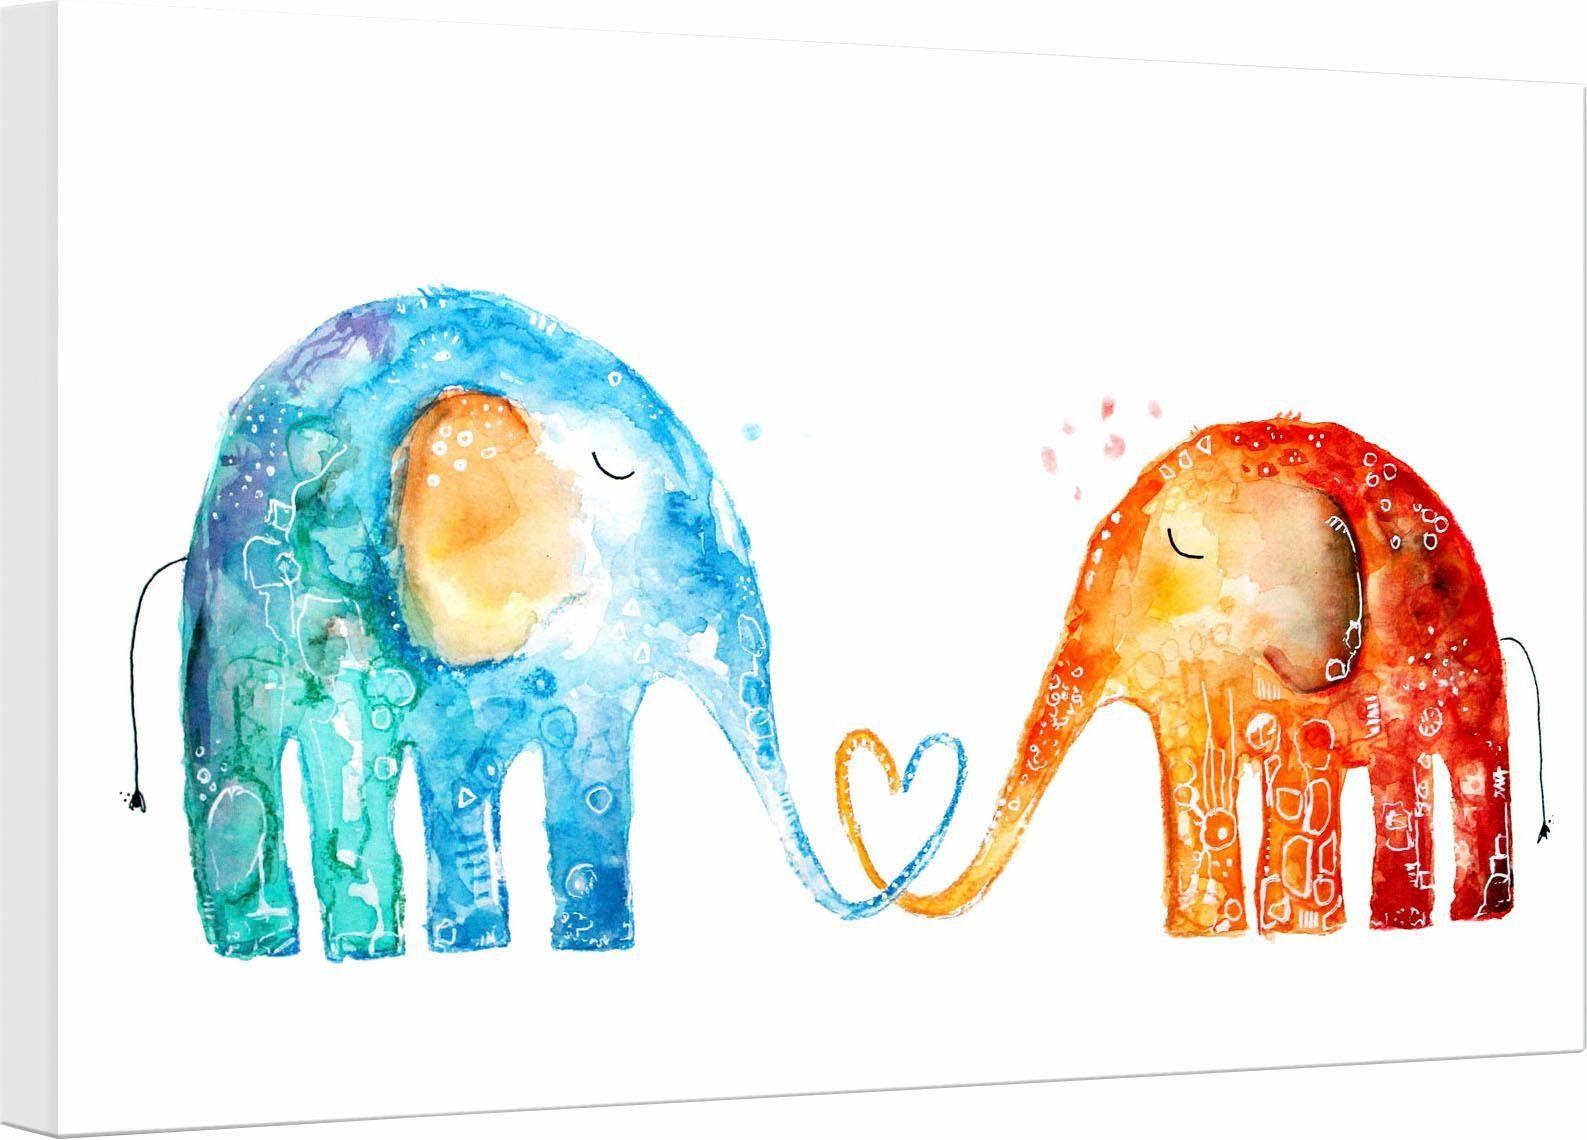 Leinwandbild »Hagenmeyer - Elefantenliebe«, Elefanten, 45/30 cm